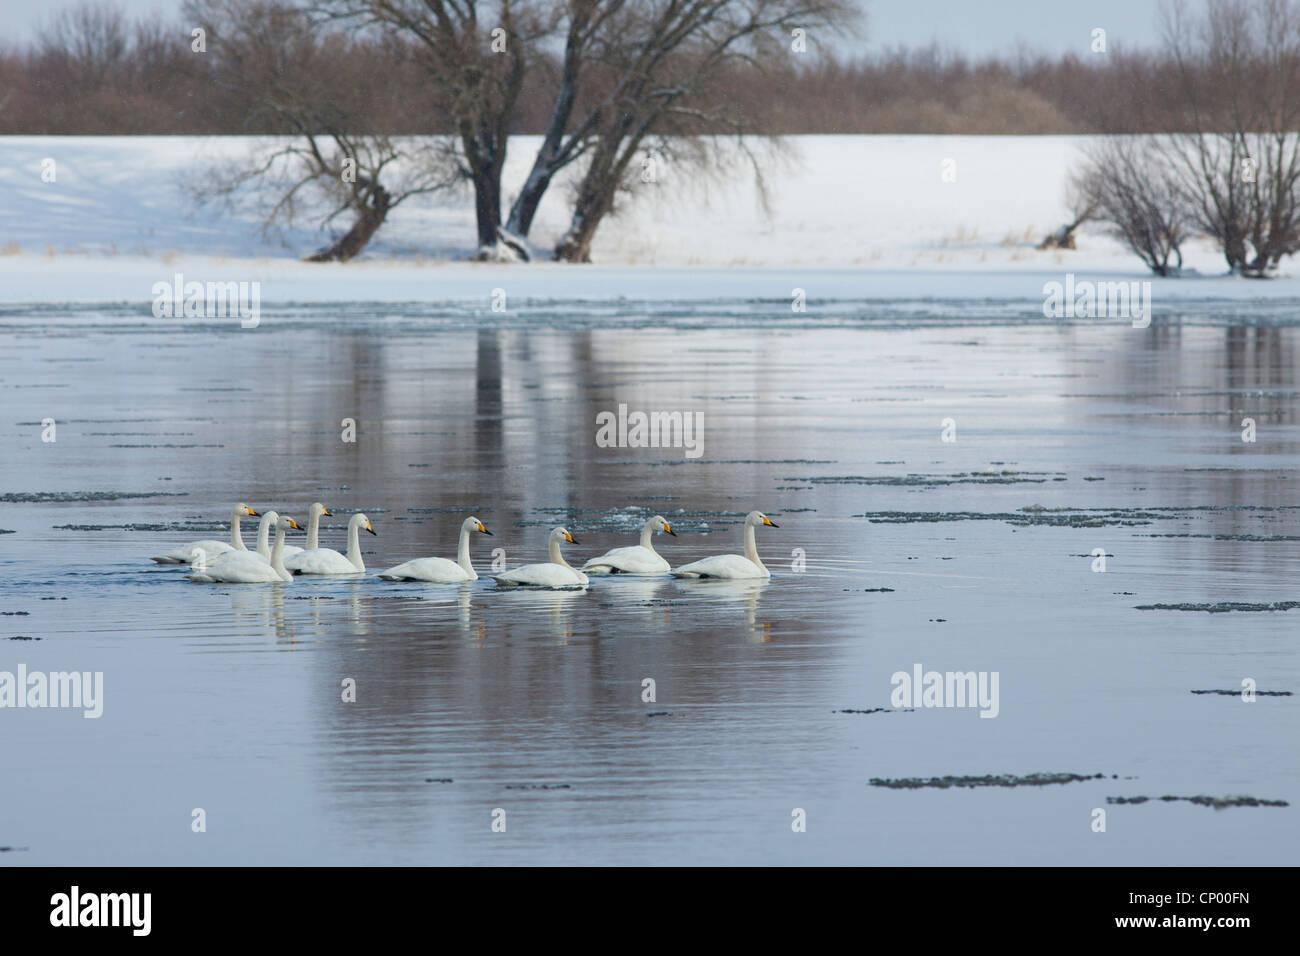 whooper swan (Cygnus cygnus), group on River Elbe in winter, Germany, Lower Saxony Stock Photo